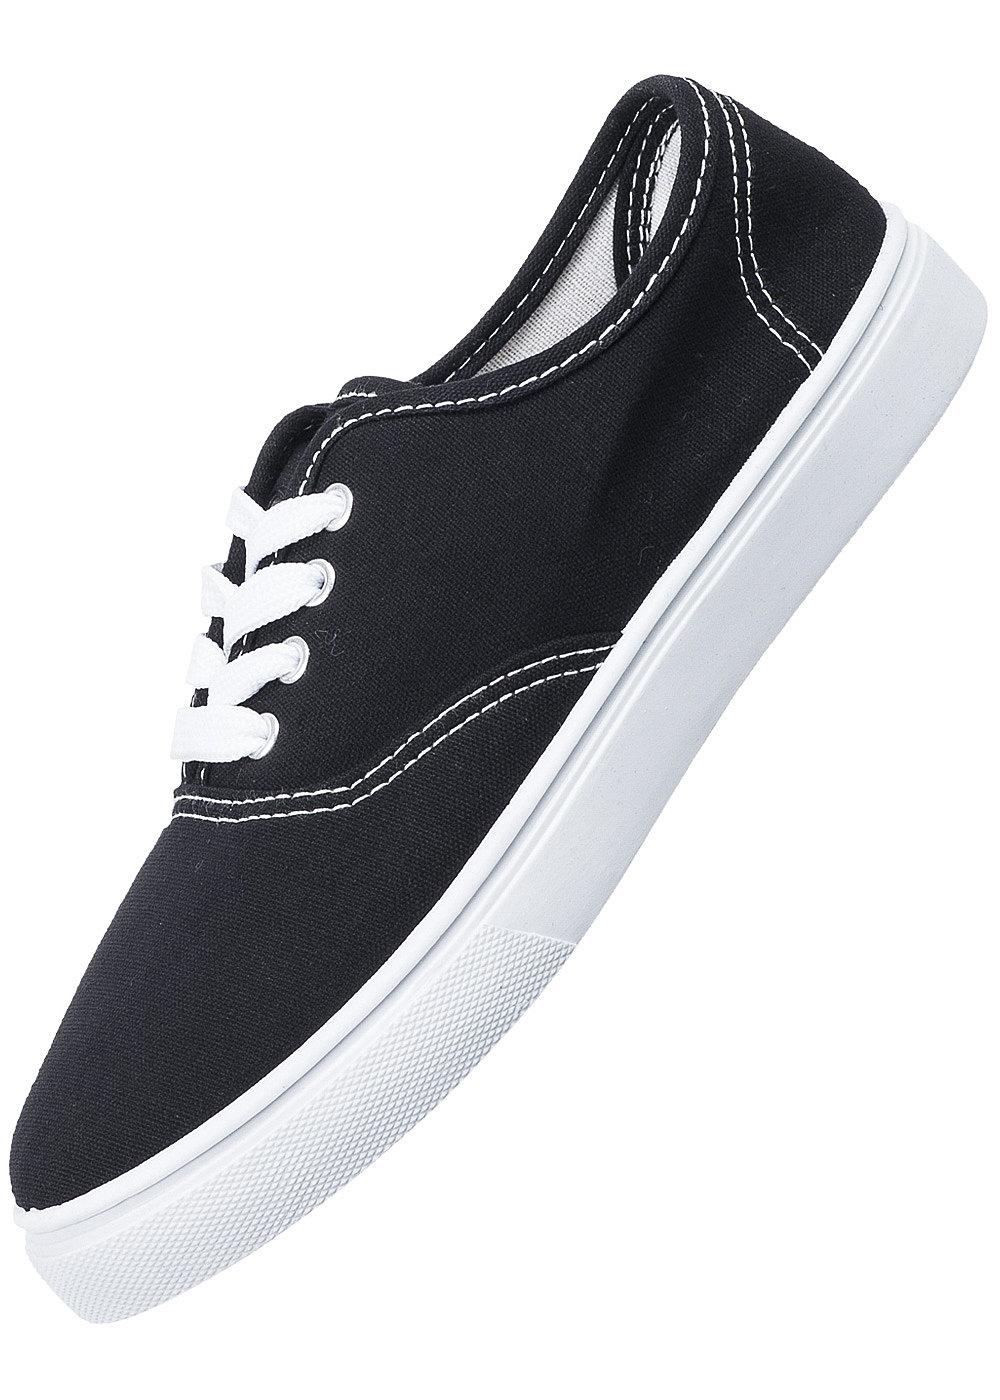 tally weijl damen schuhe aflcheese hh sneaker flach schwarz weiss ebay. Black Bedroom Furniture Sets. Home Design Ideas